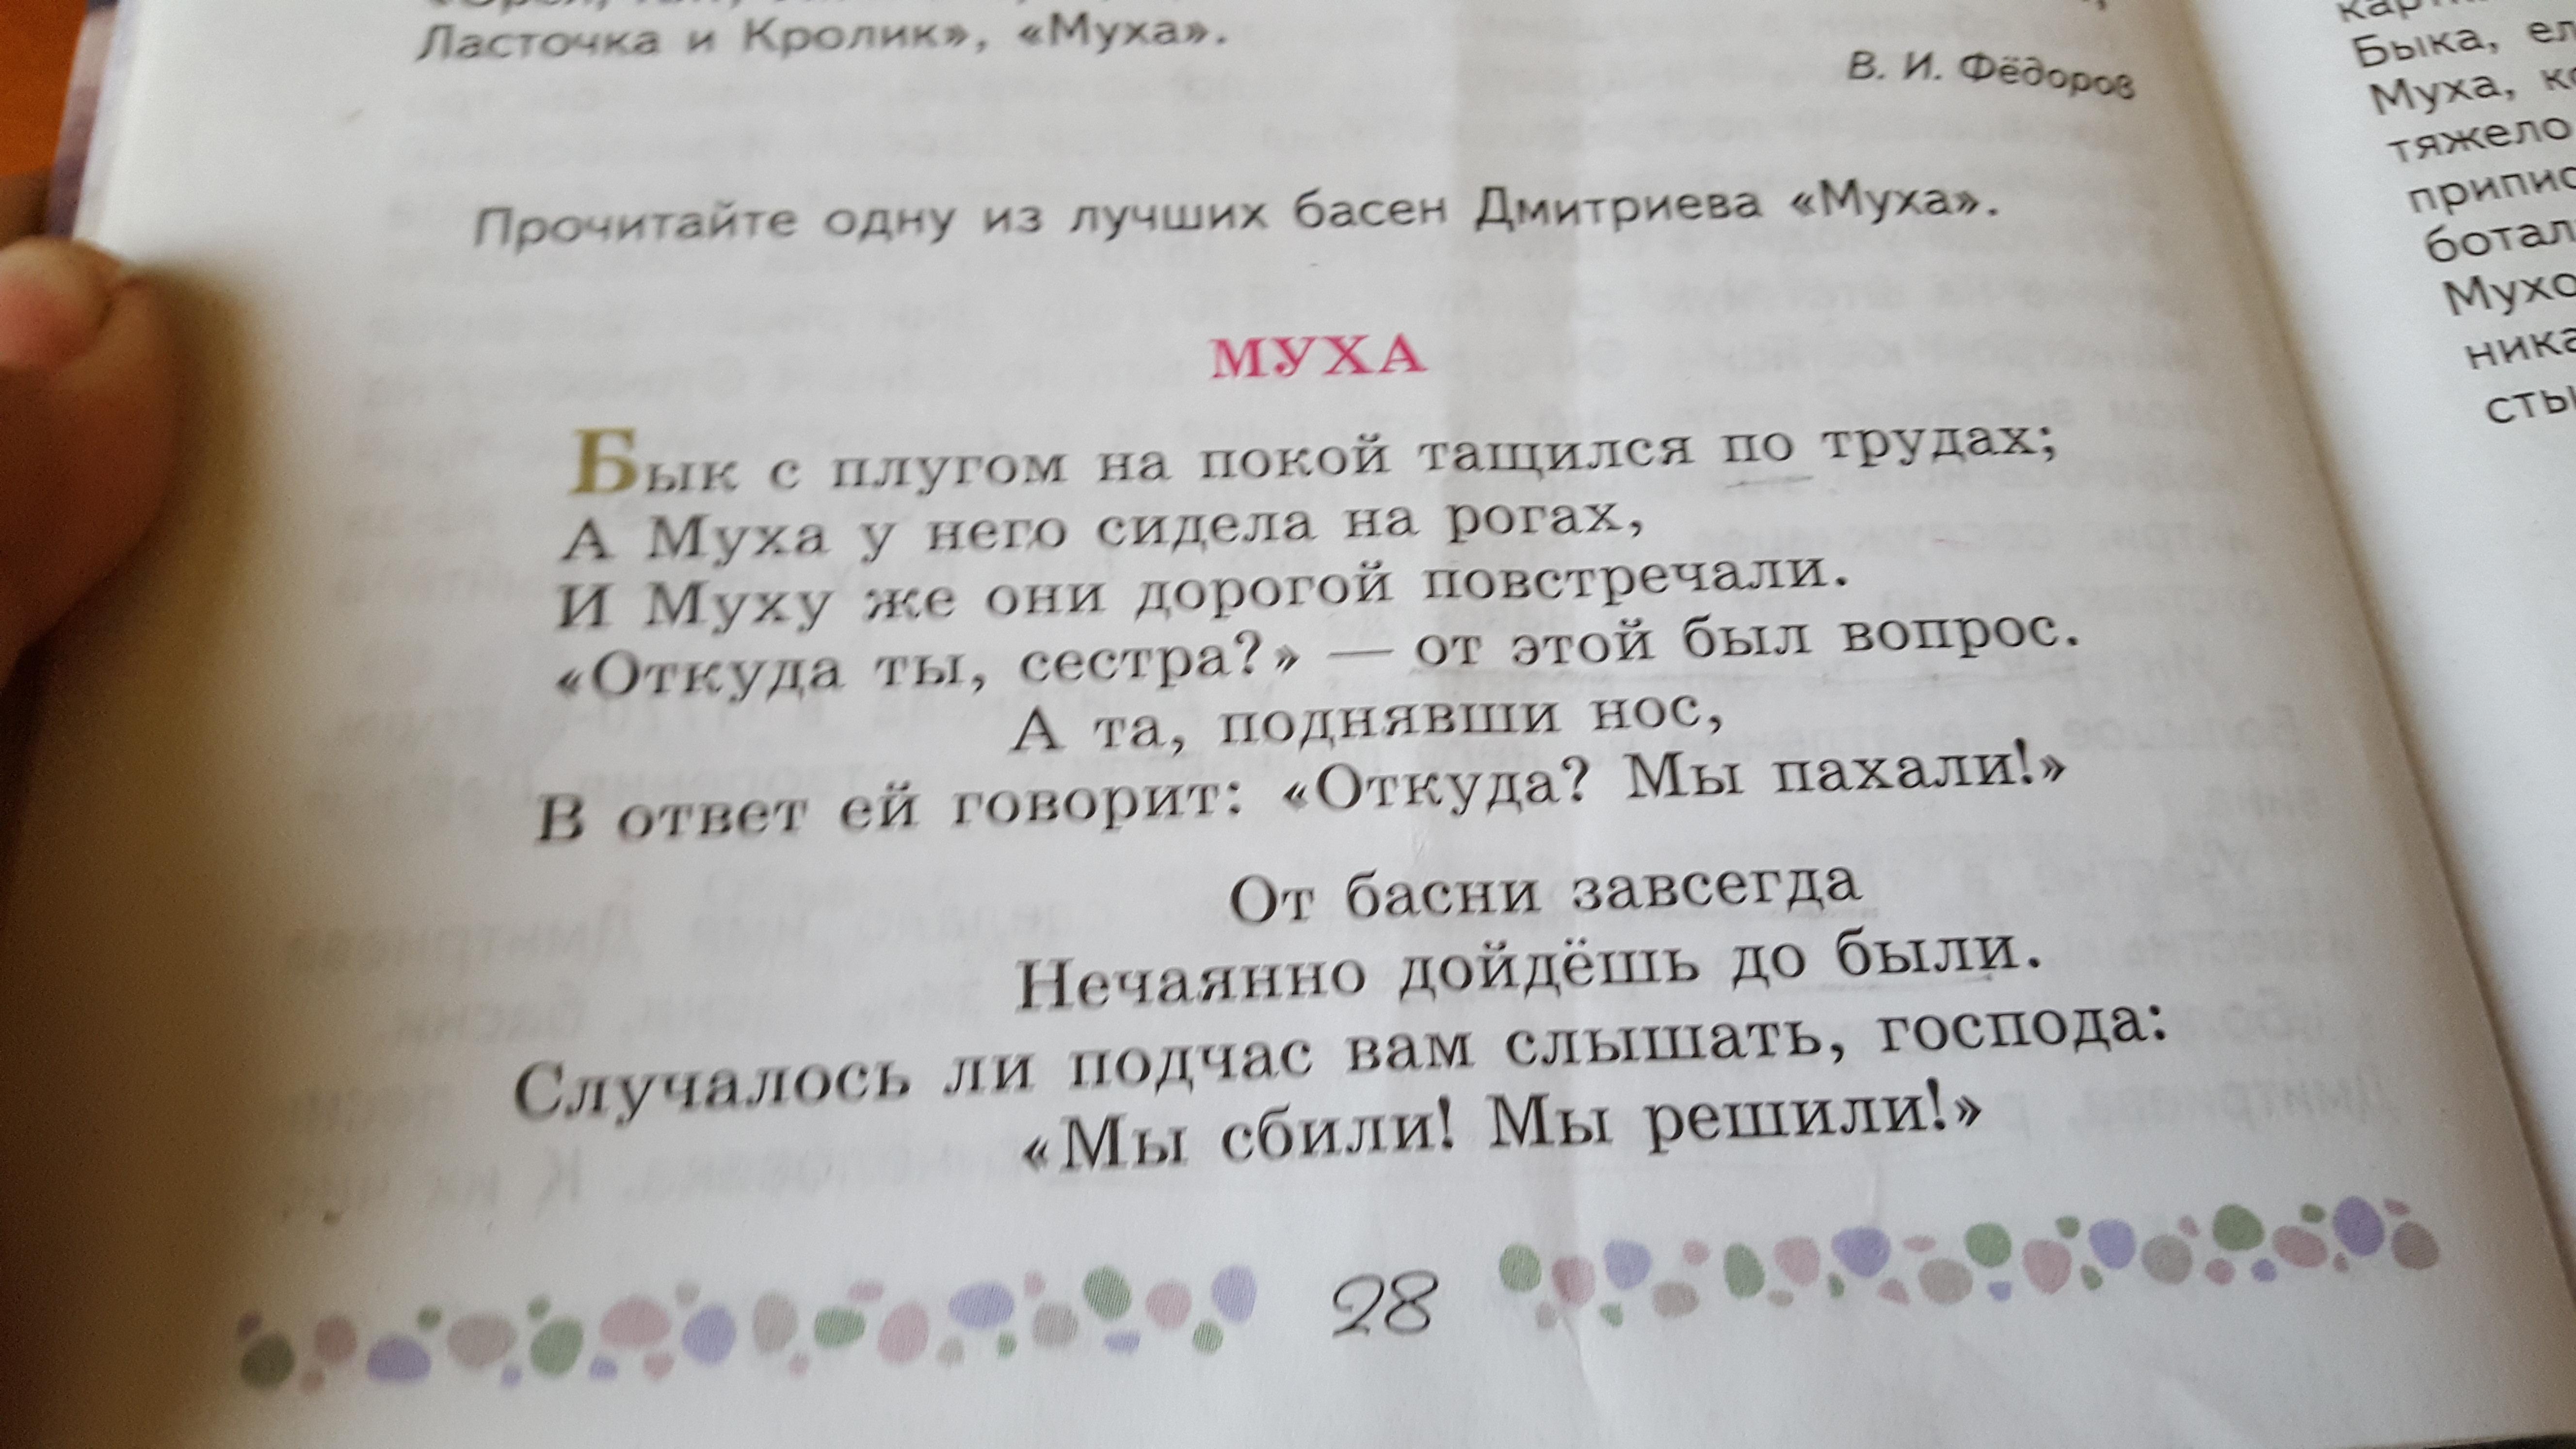 Басня дмитриева муха доклад 5254